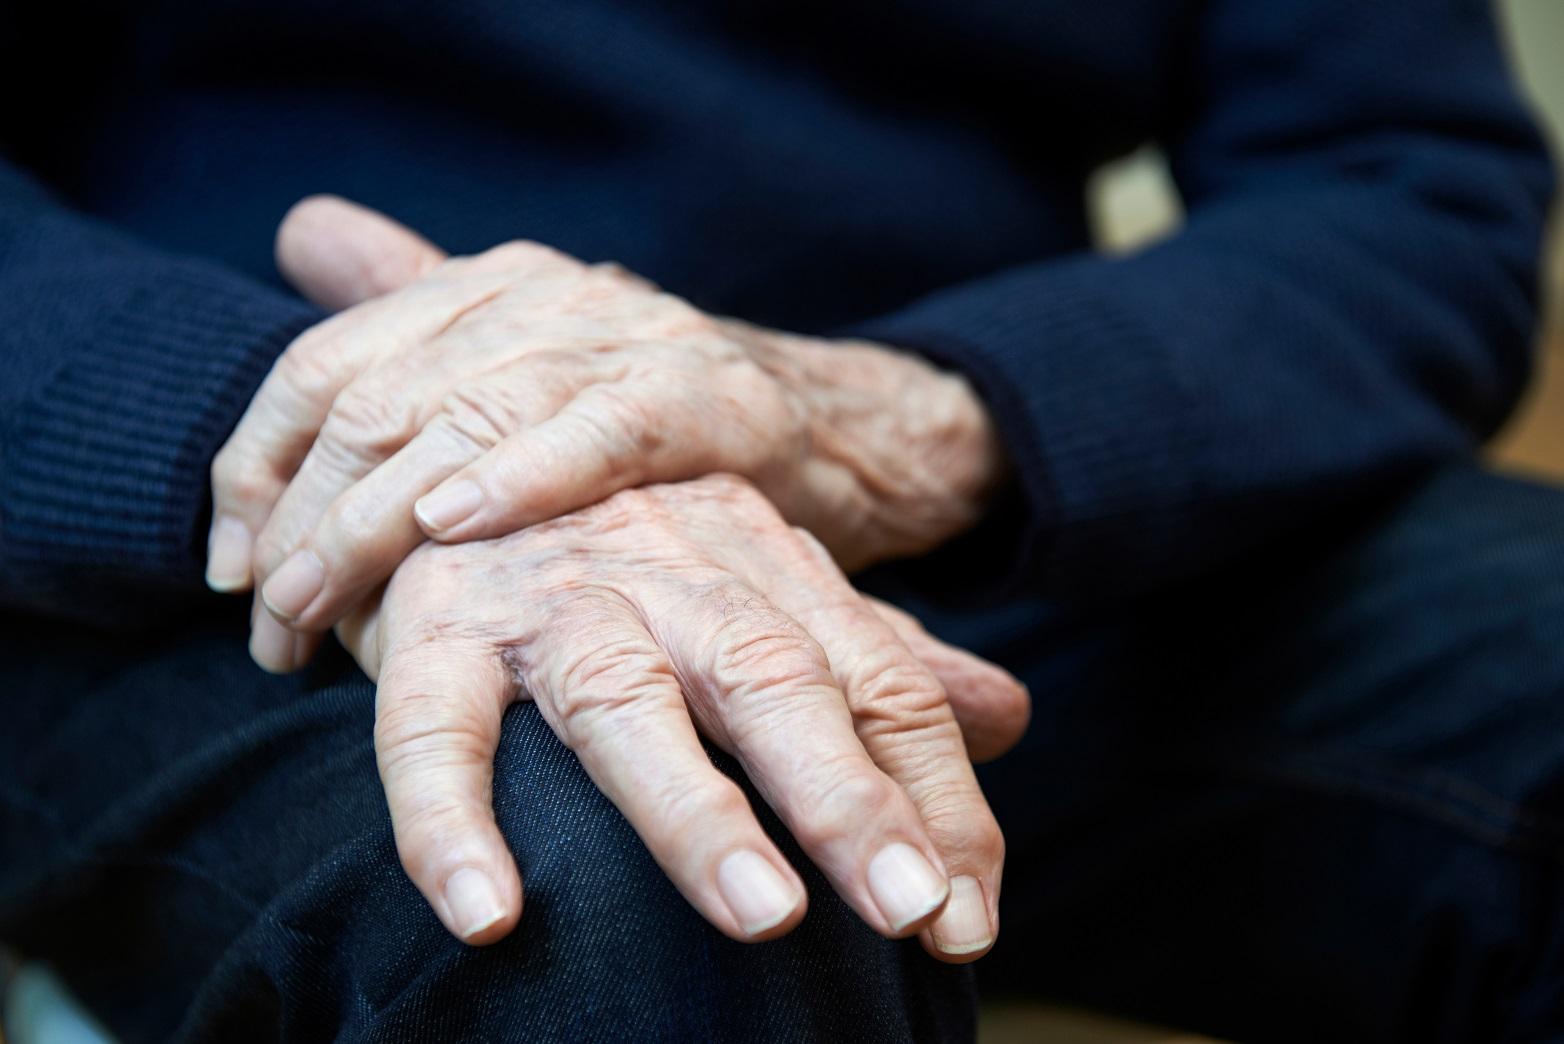 Parkinson's Disease shaking hand